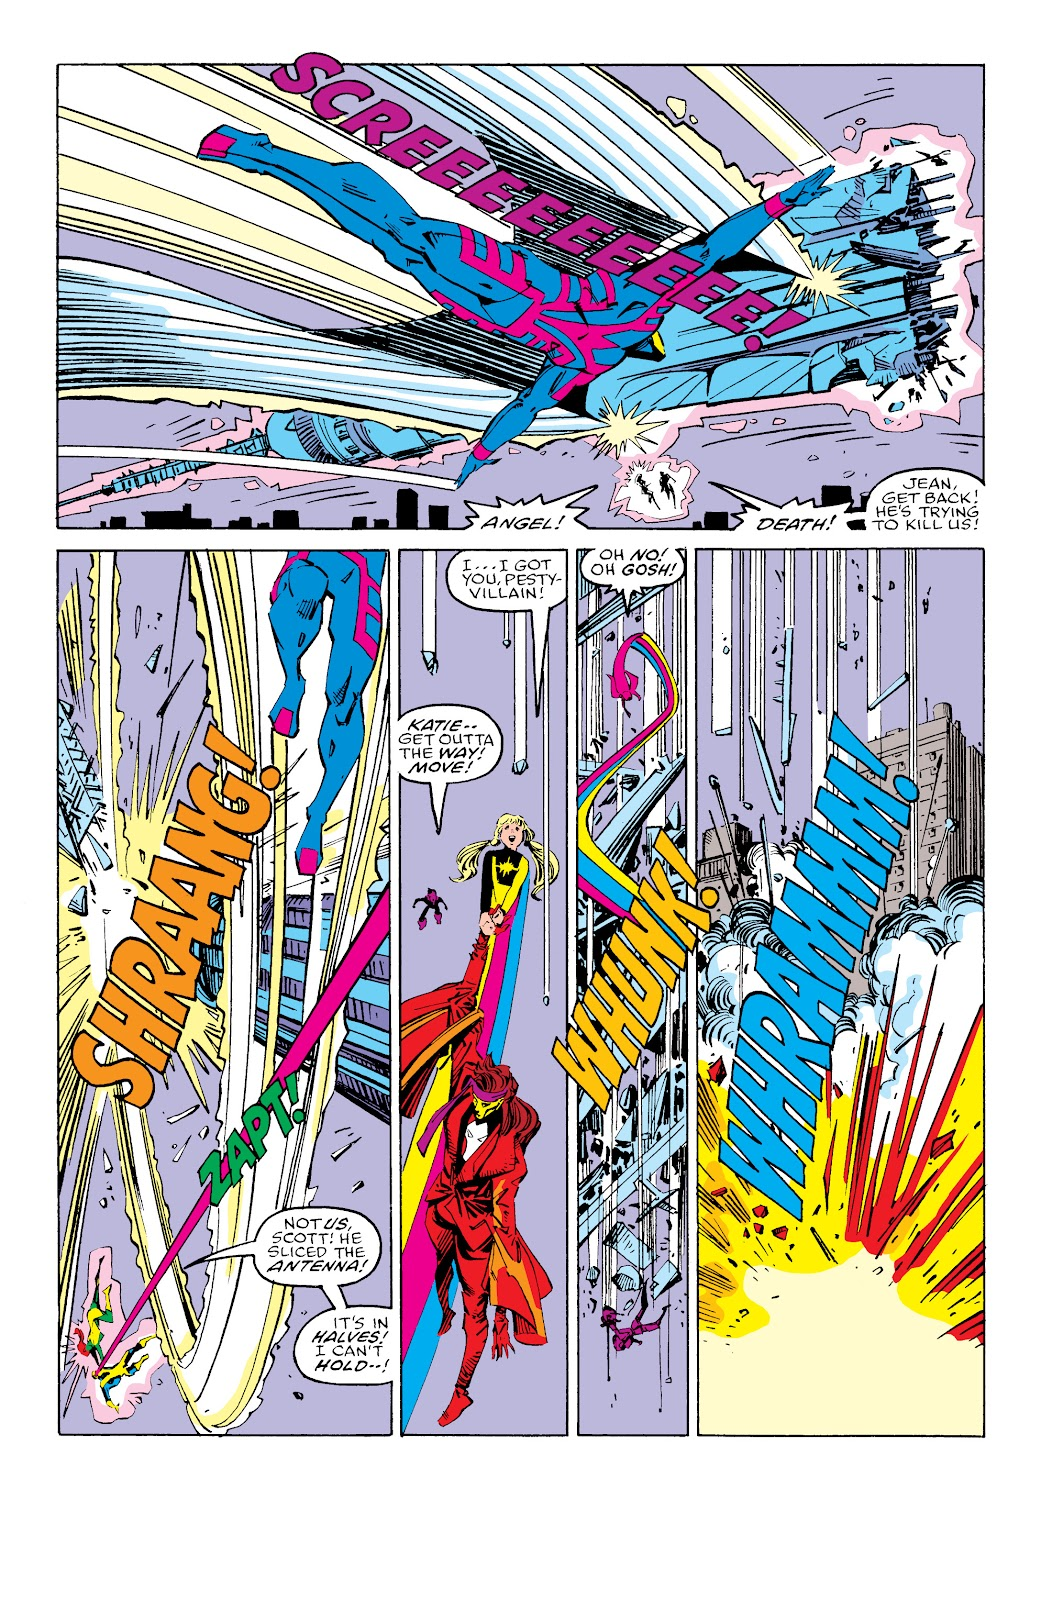 Read online X-Men Milestones: Fall of the Mutants comic -  Issue # TPB (Part 3) - 28